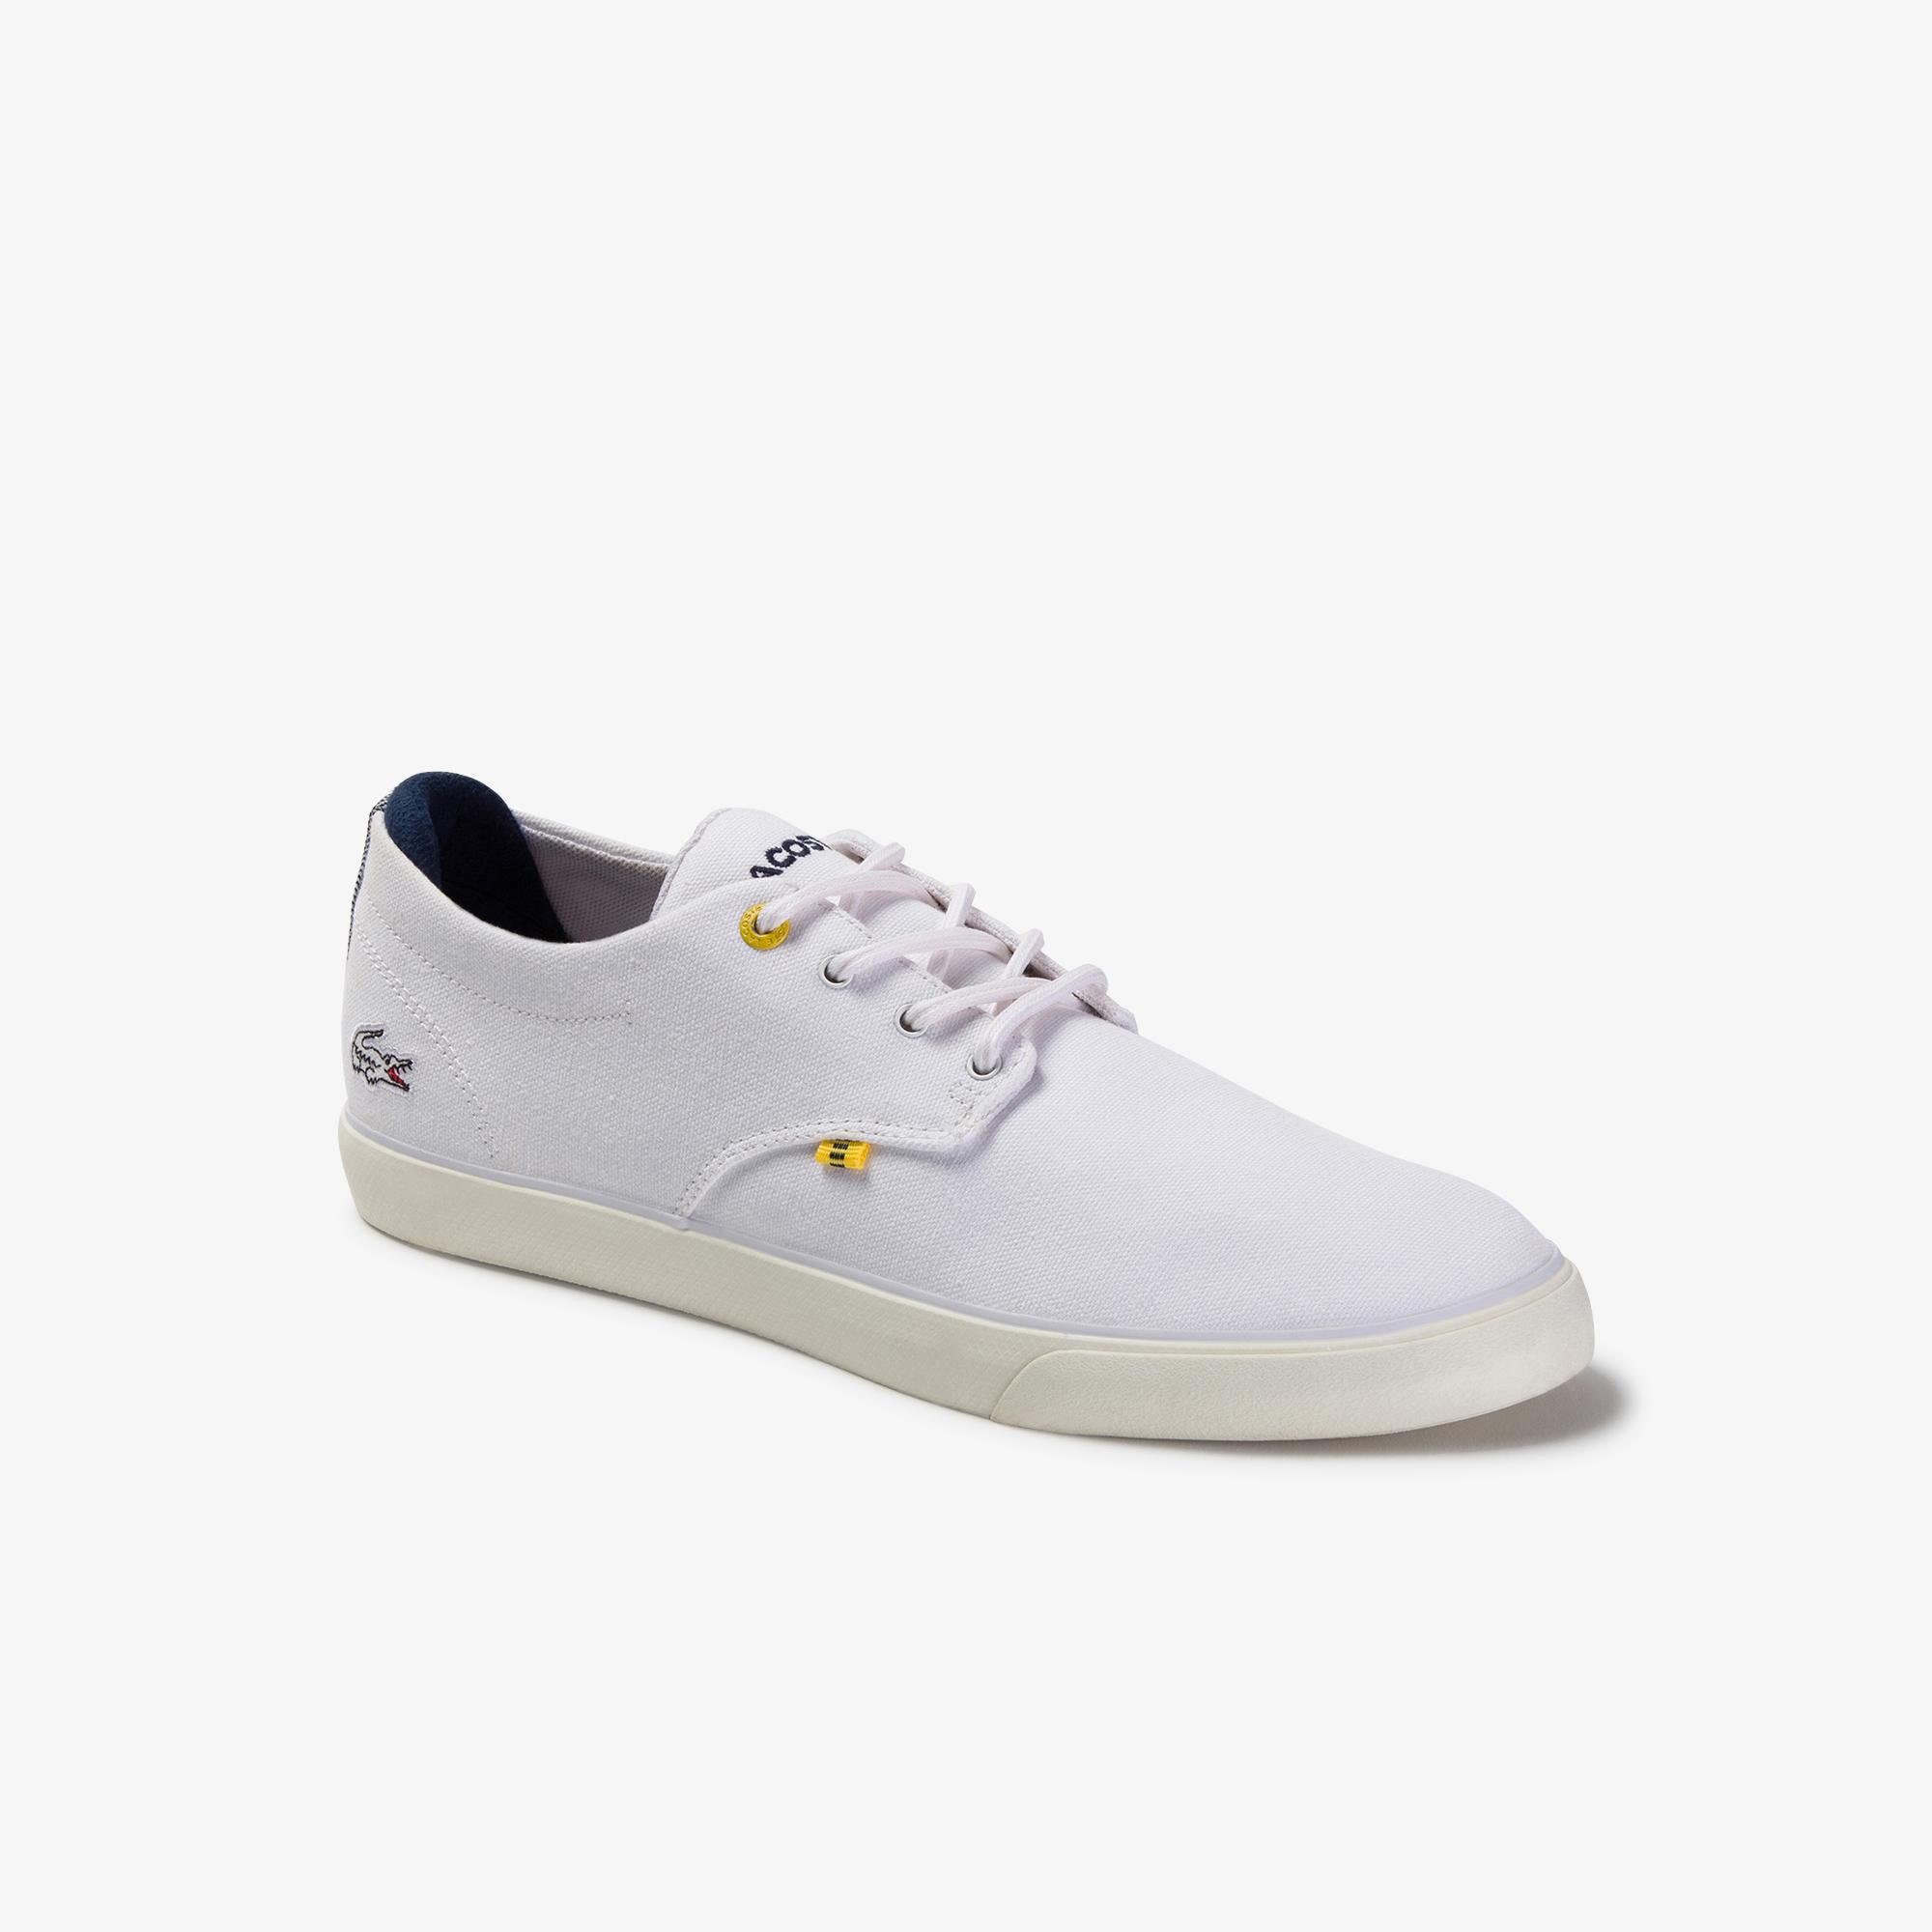 Lacoste Esparre 220 3 Męskie Sneakersy